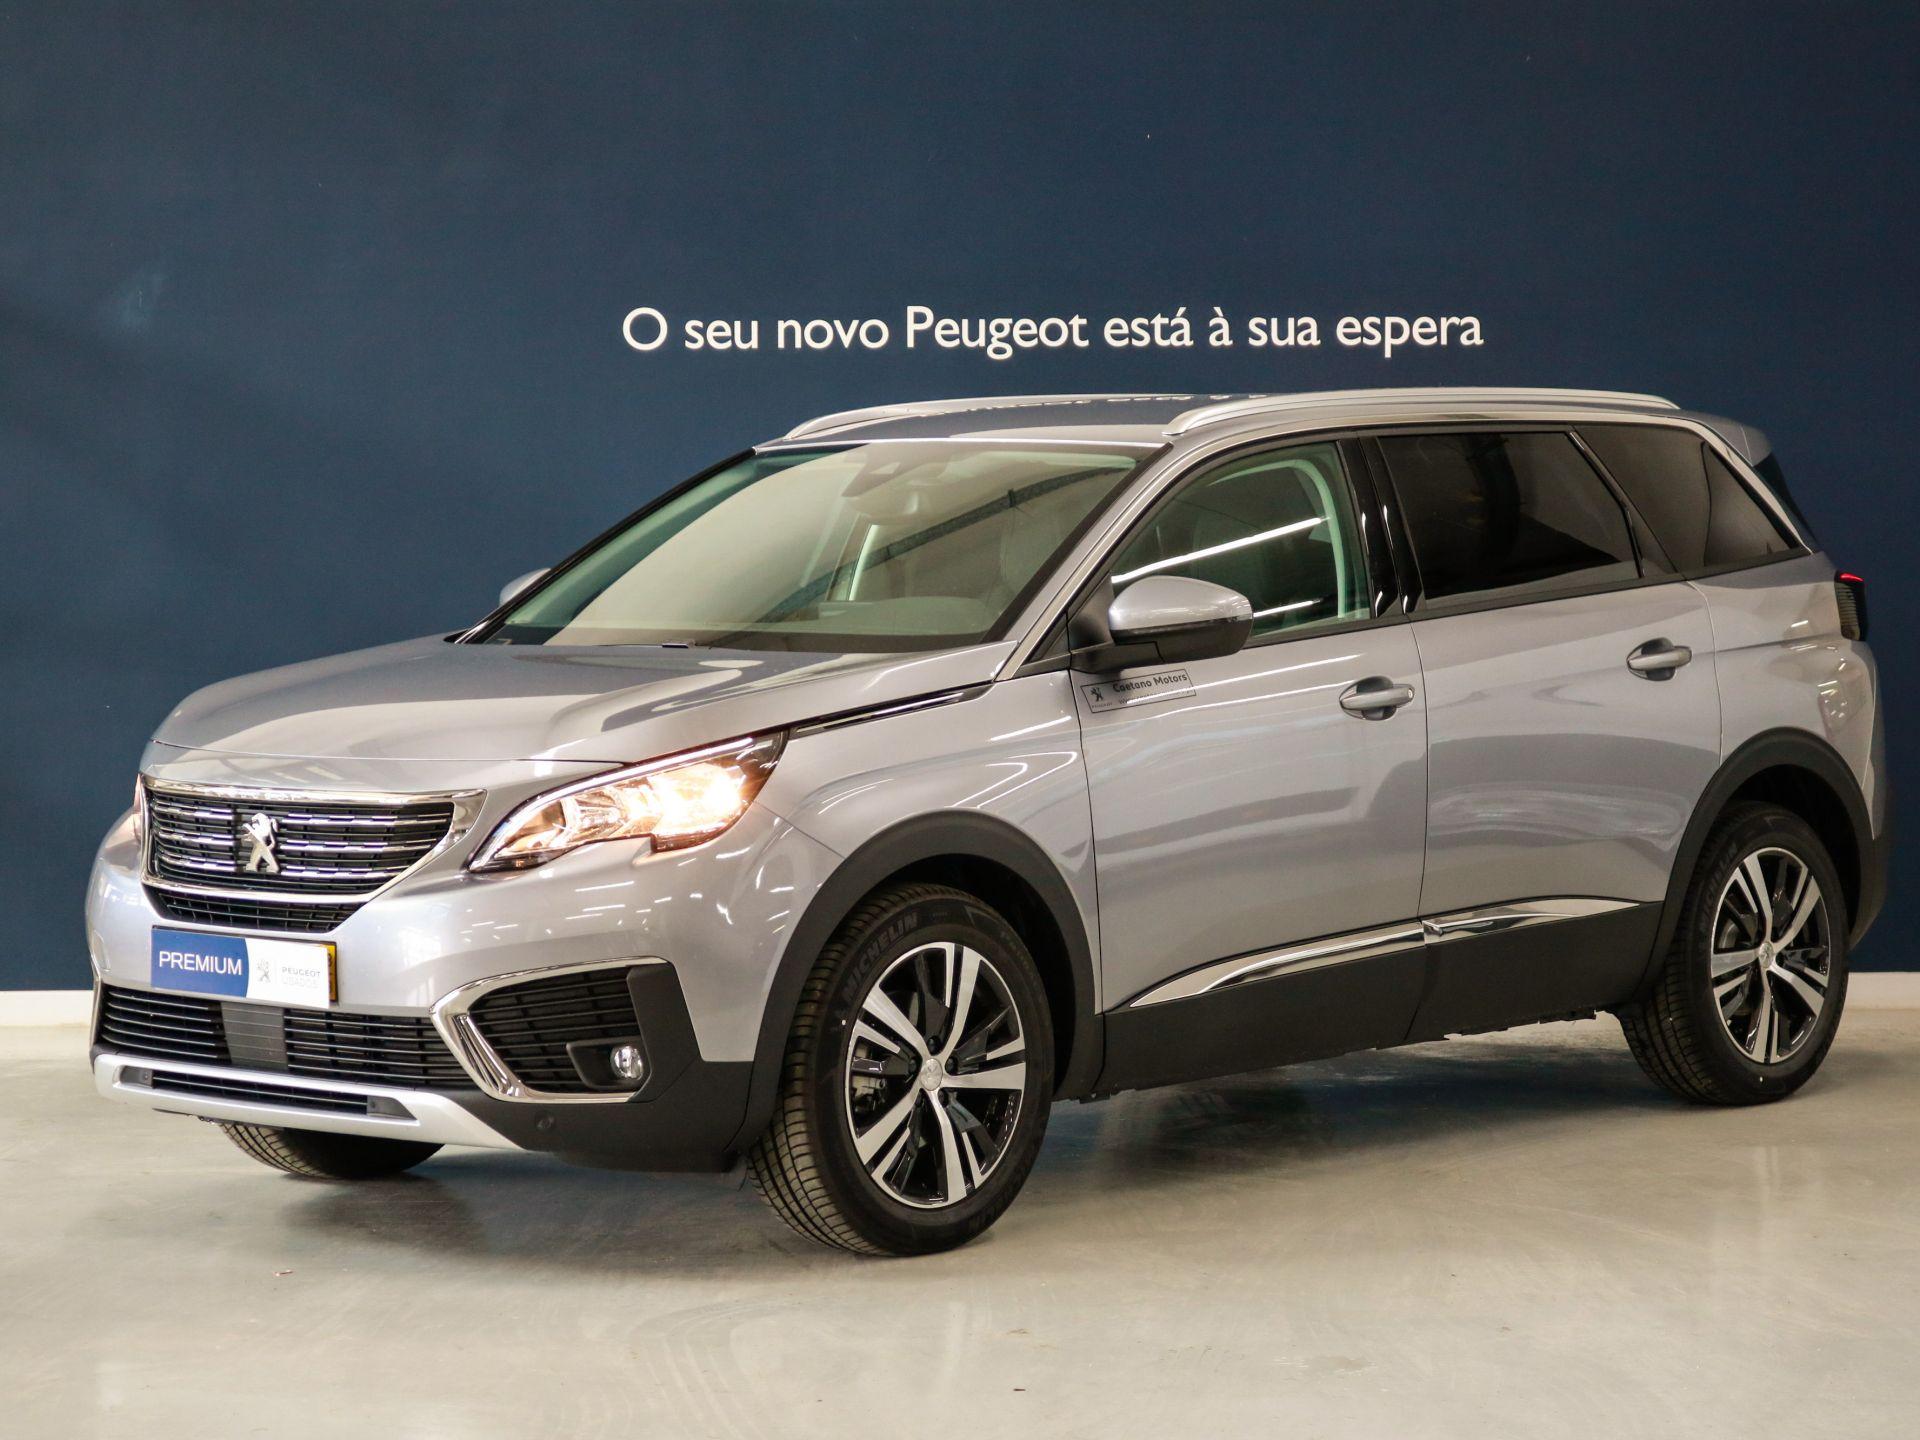 Peugeot 5008 Allure 1.5 BlueHDi 130 CVM6 segunda mão Setúbal